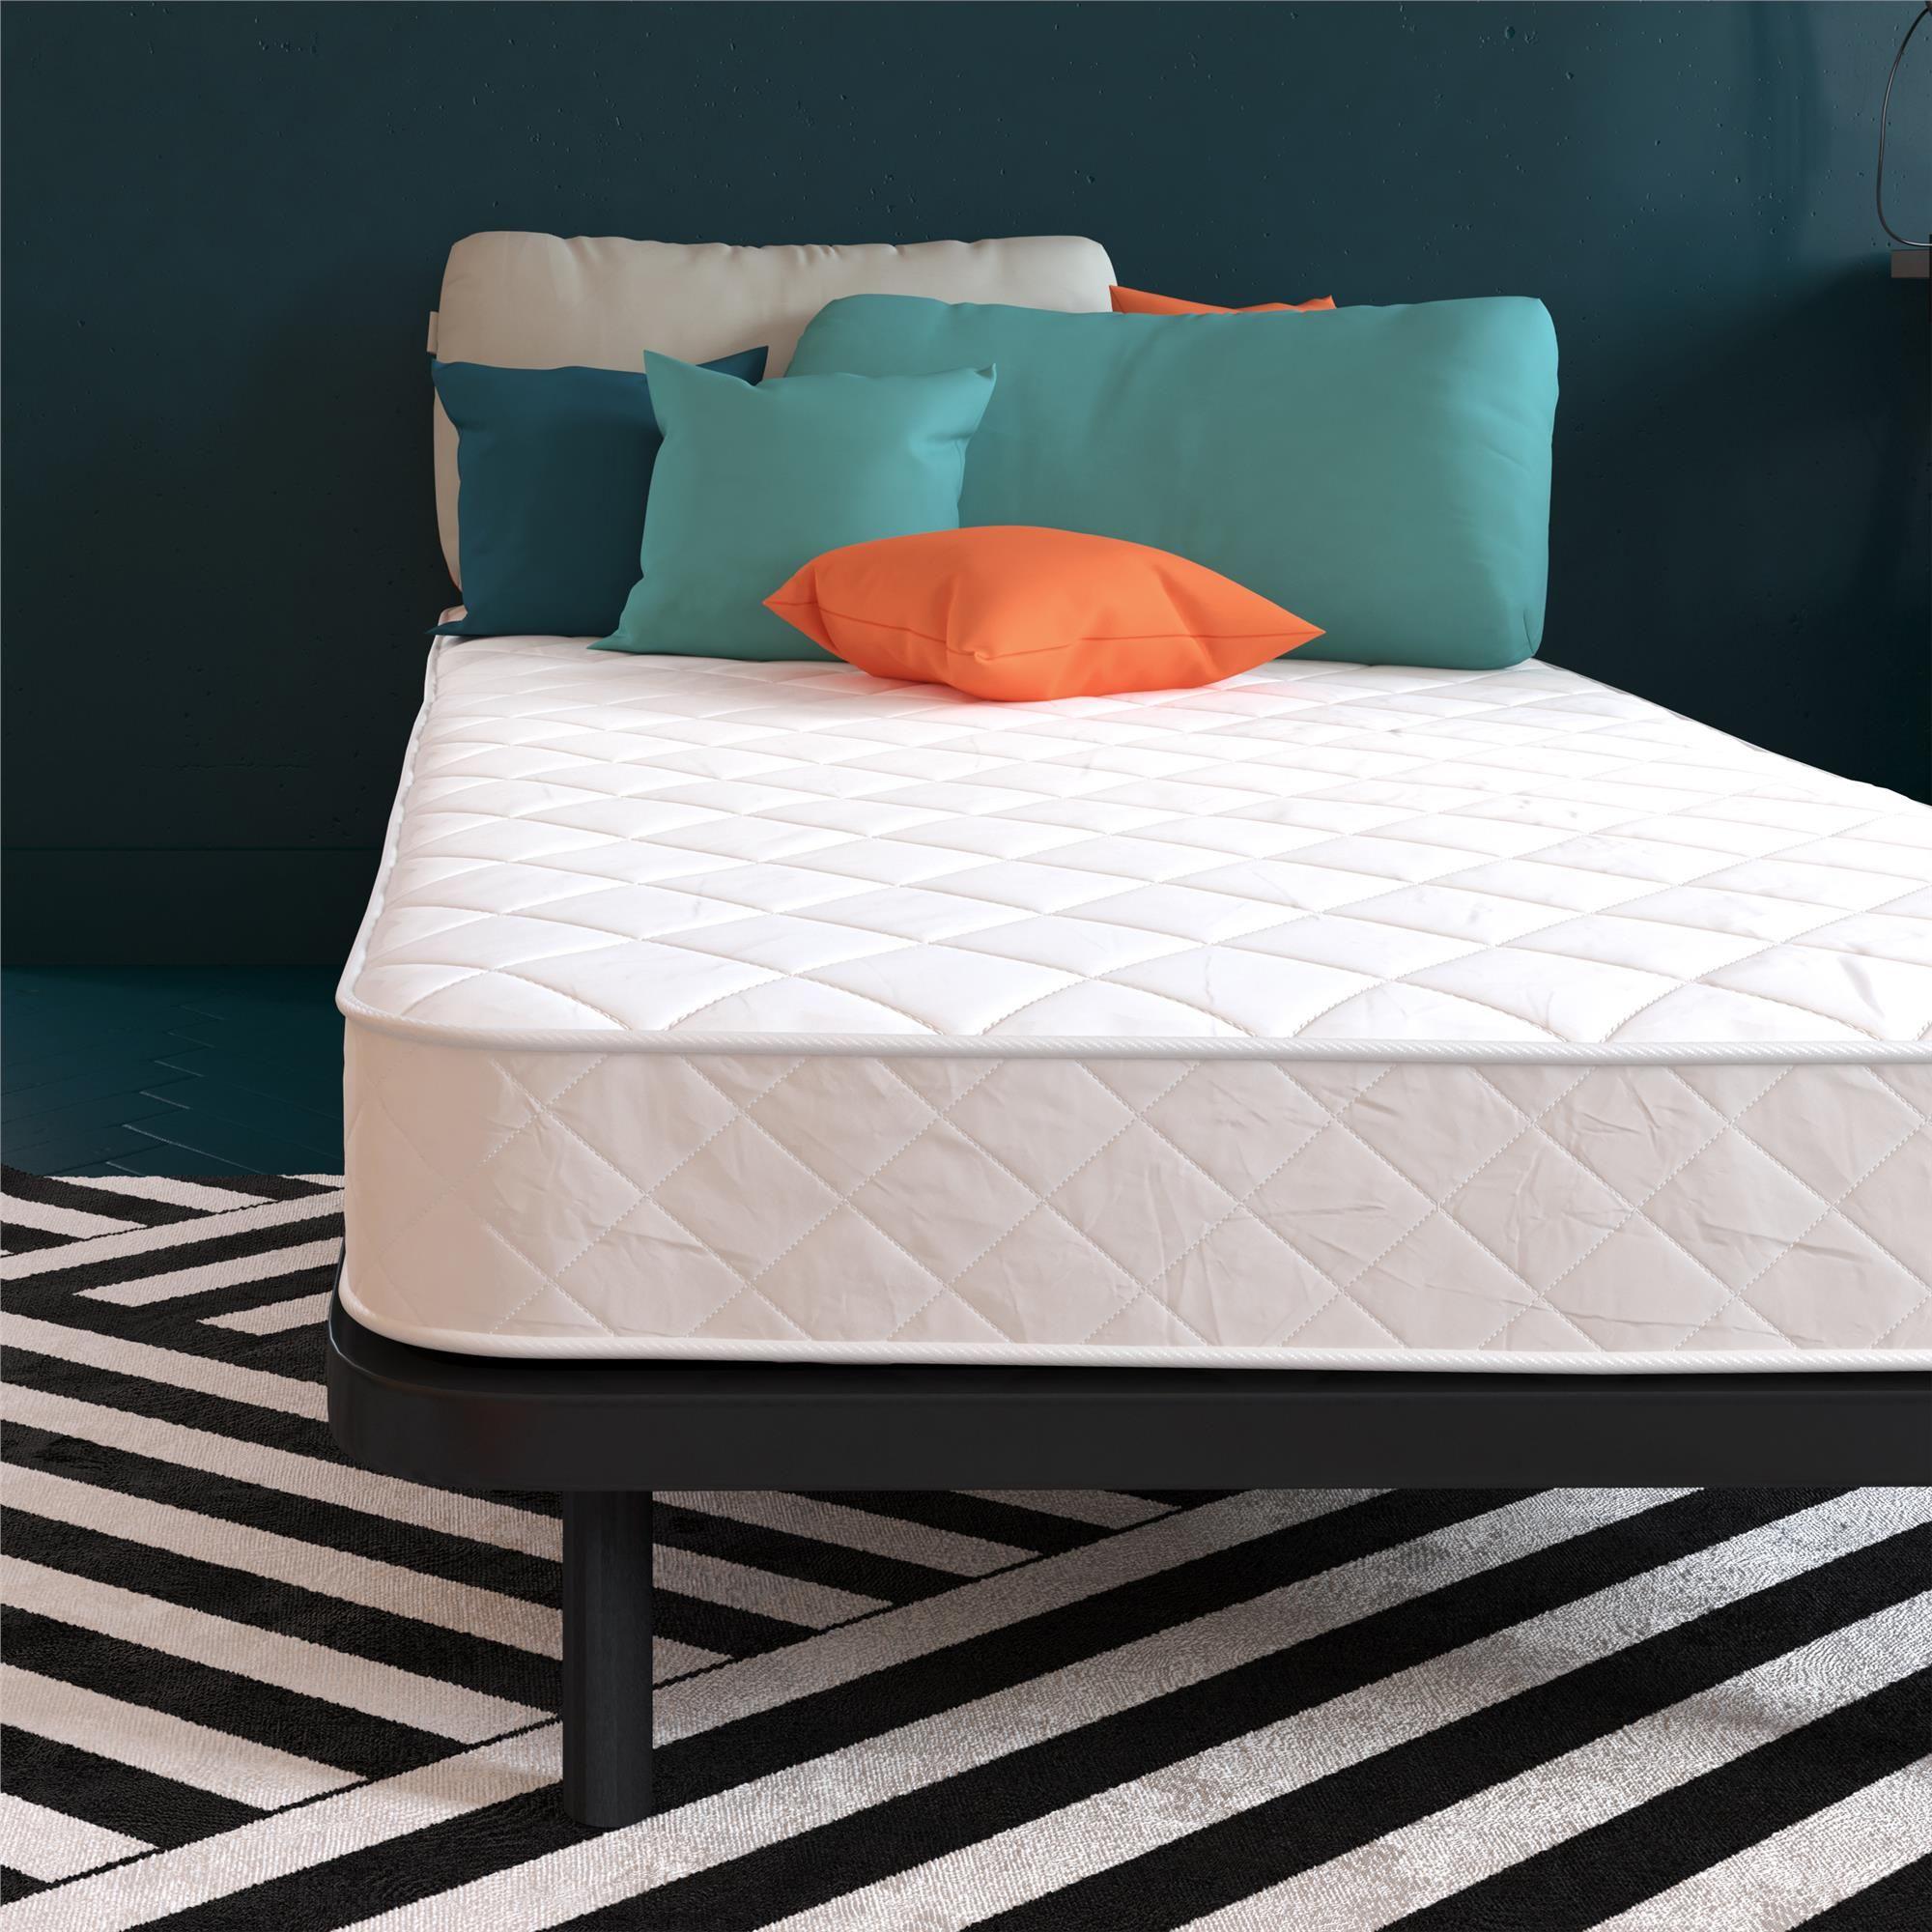 Continental Sleep 10 Inch Eurotop Pillowtop Fully Assembled Innerspring Mattress And 8 Inch Semi Flex Box Spring Twin Xl Size Gray Mattress Furniture Twin Xl